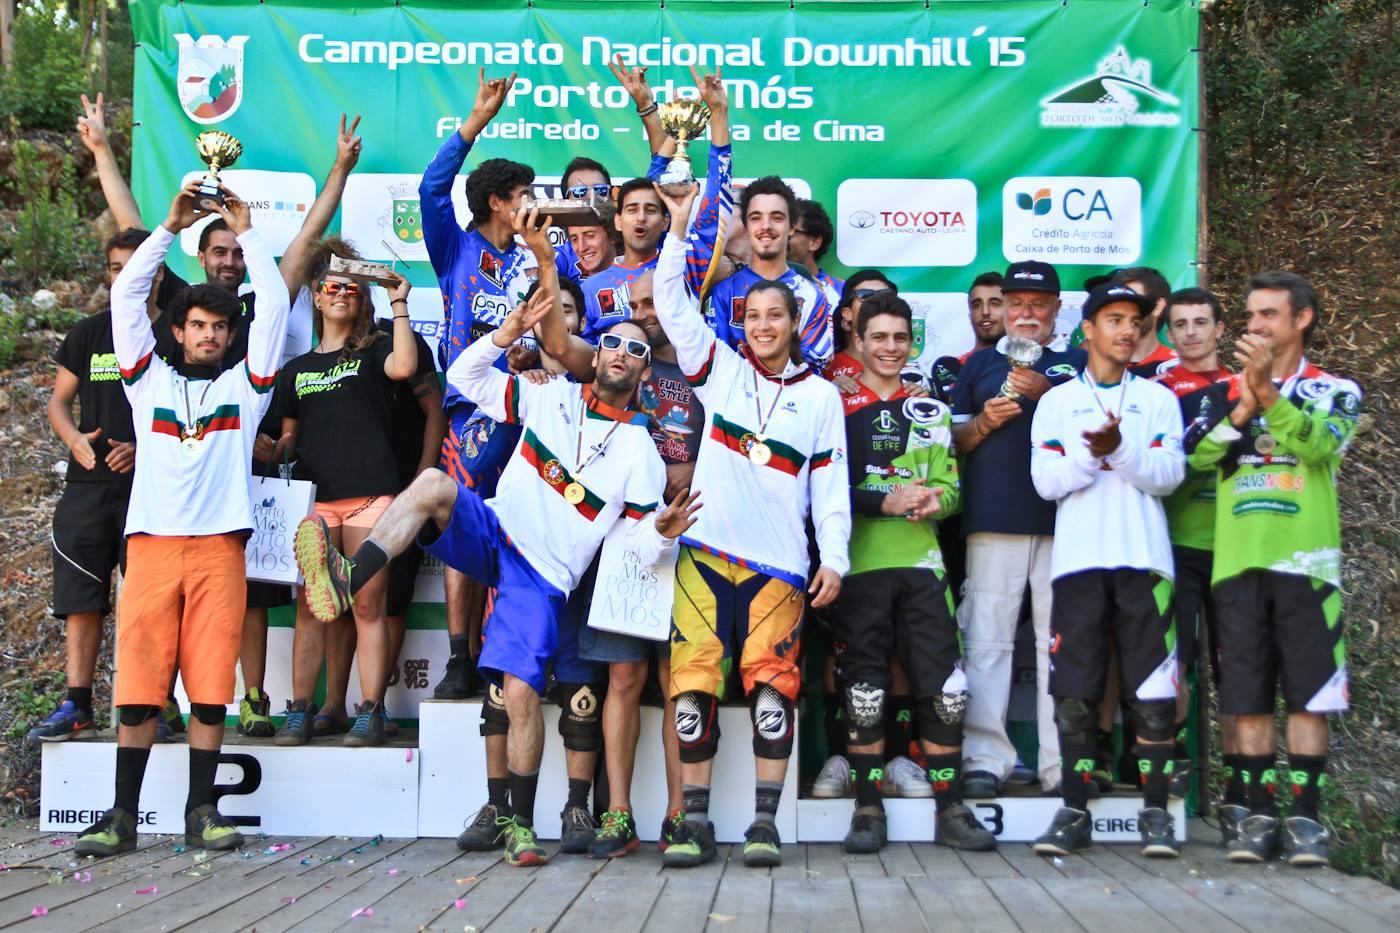 Campeonato Nacional DHI 2015